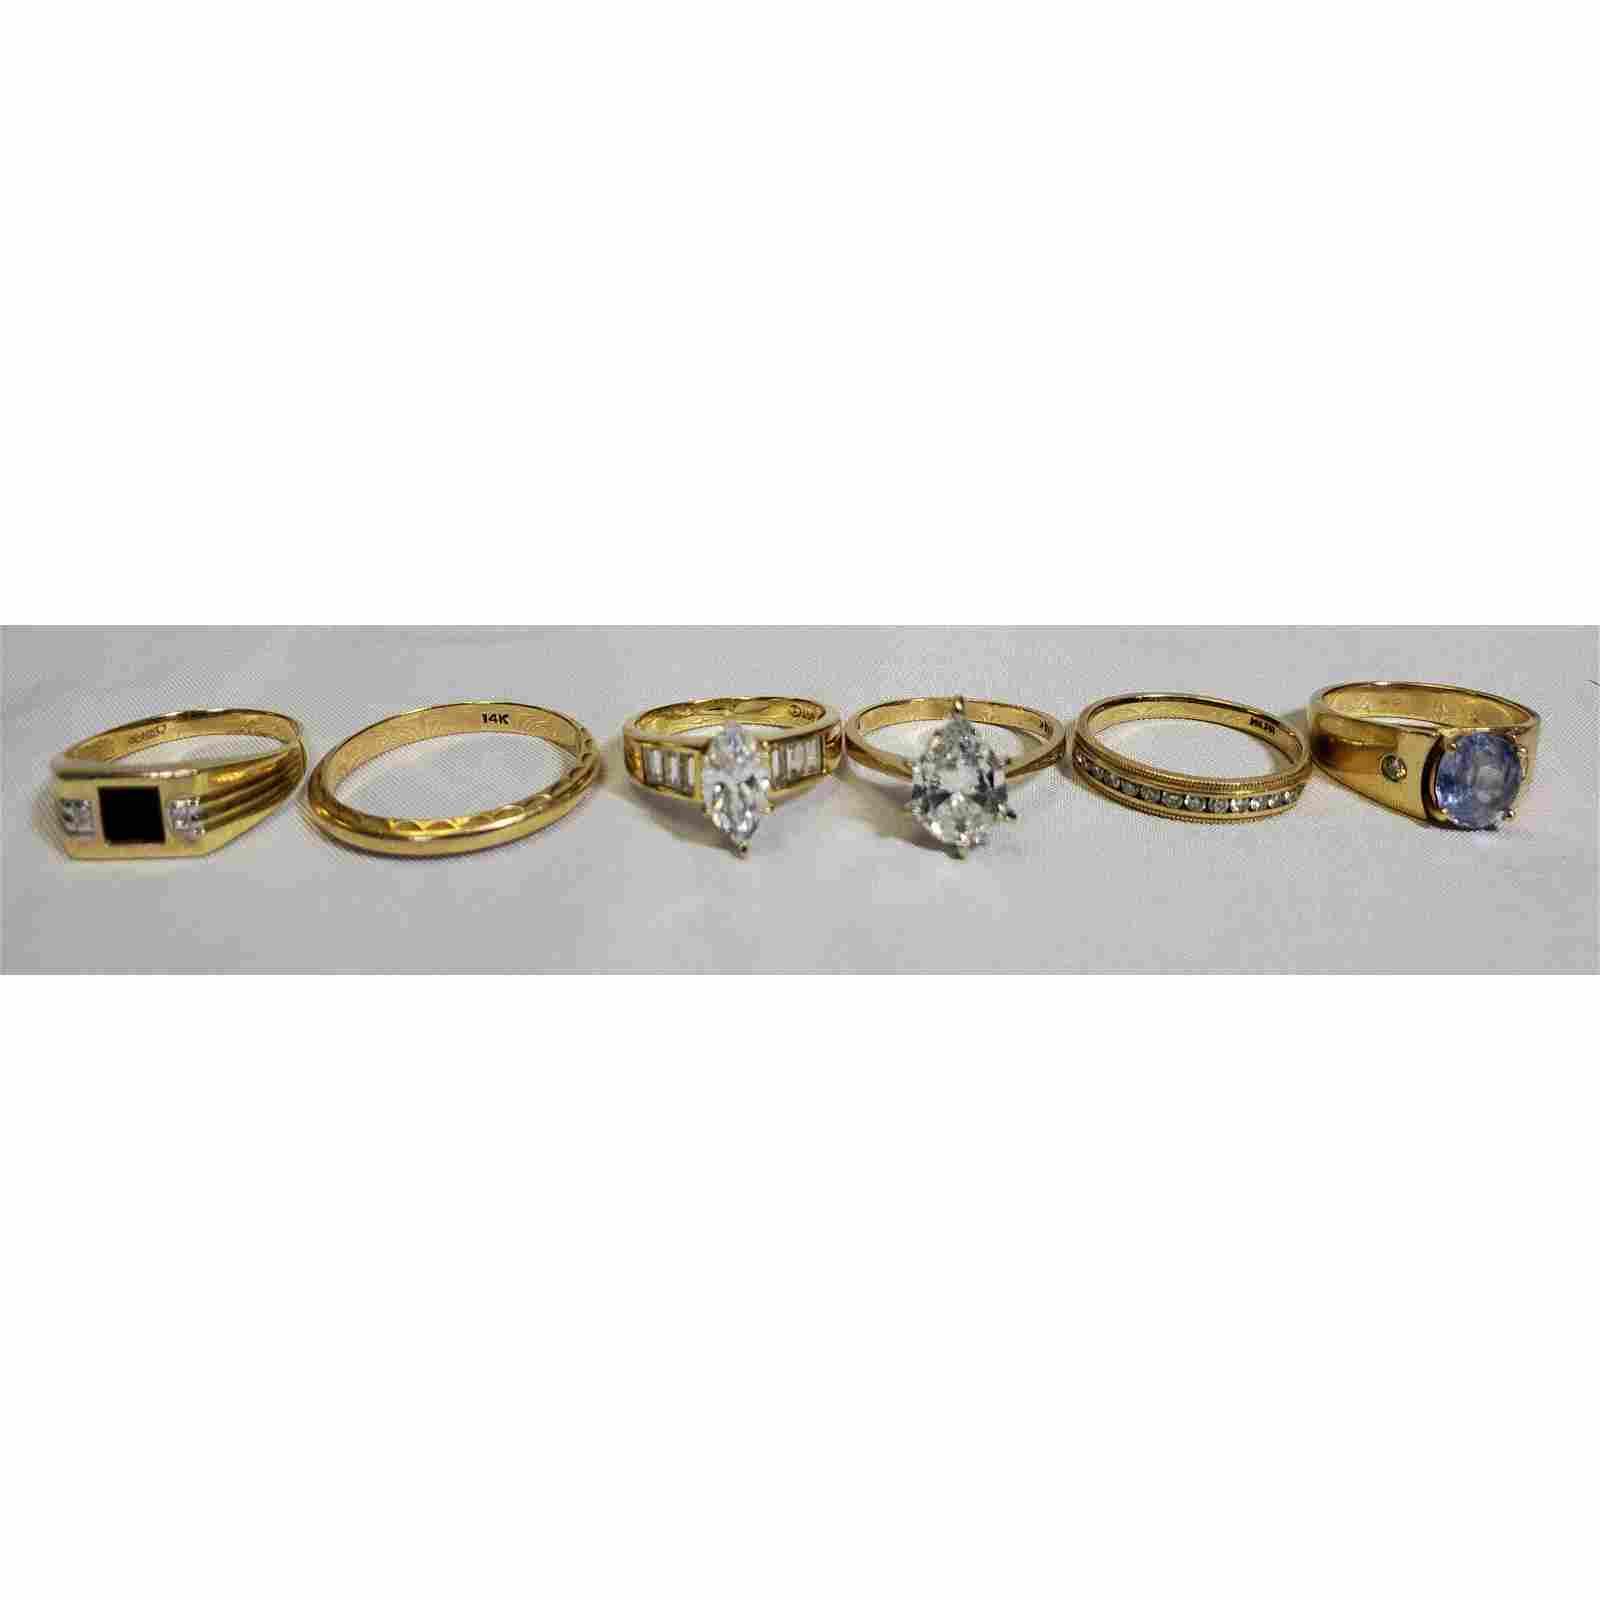 Estate lot 14k Gold Rings Gemstones & Diamonds 22.7 gr.